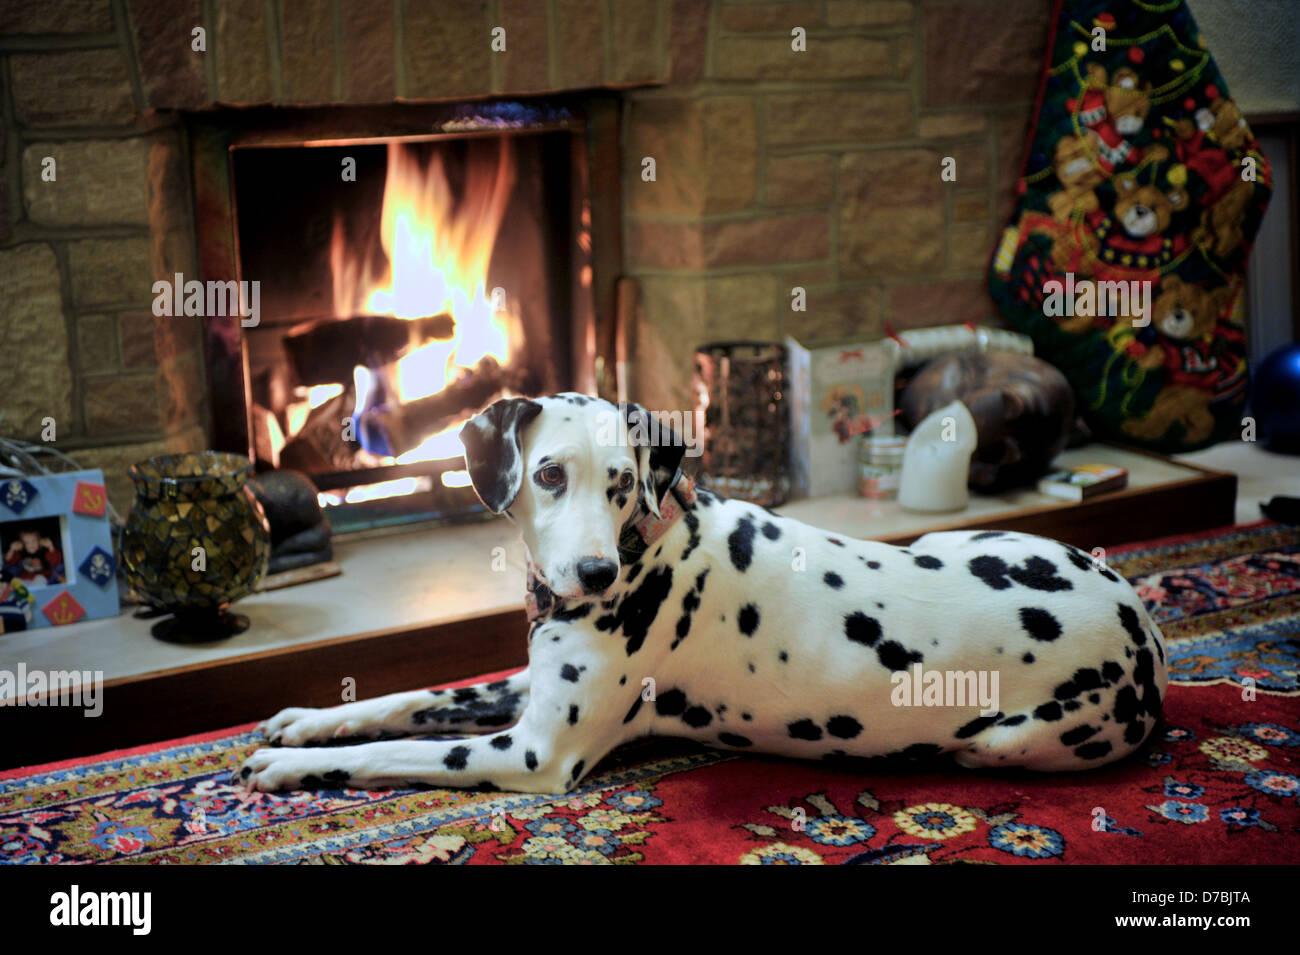 Fireside Dalmatian. - Stock Image